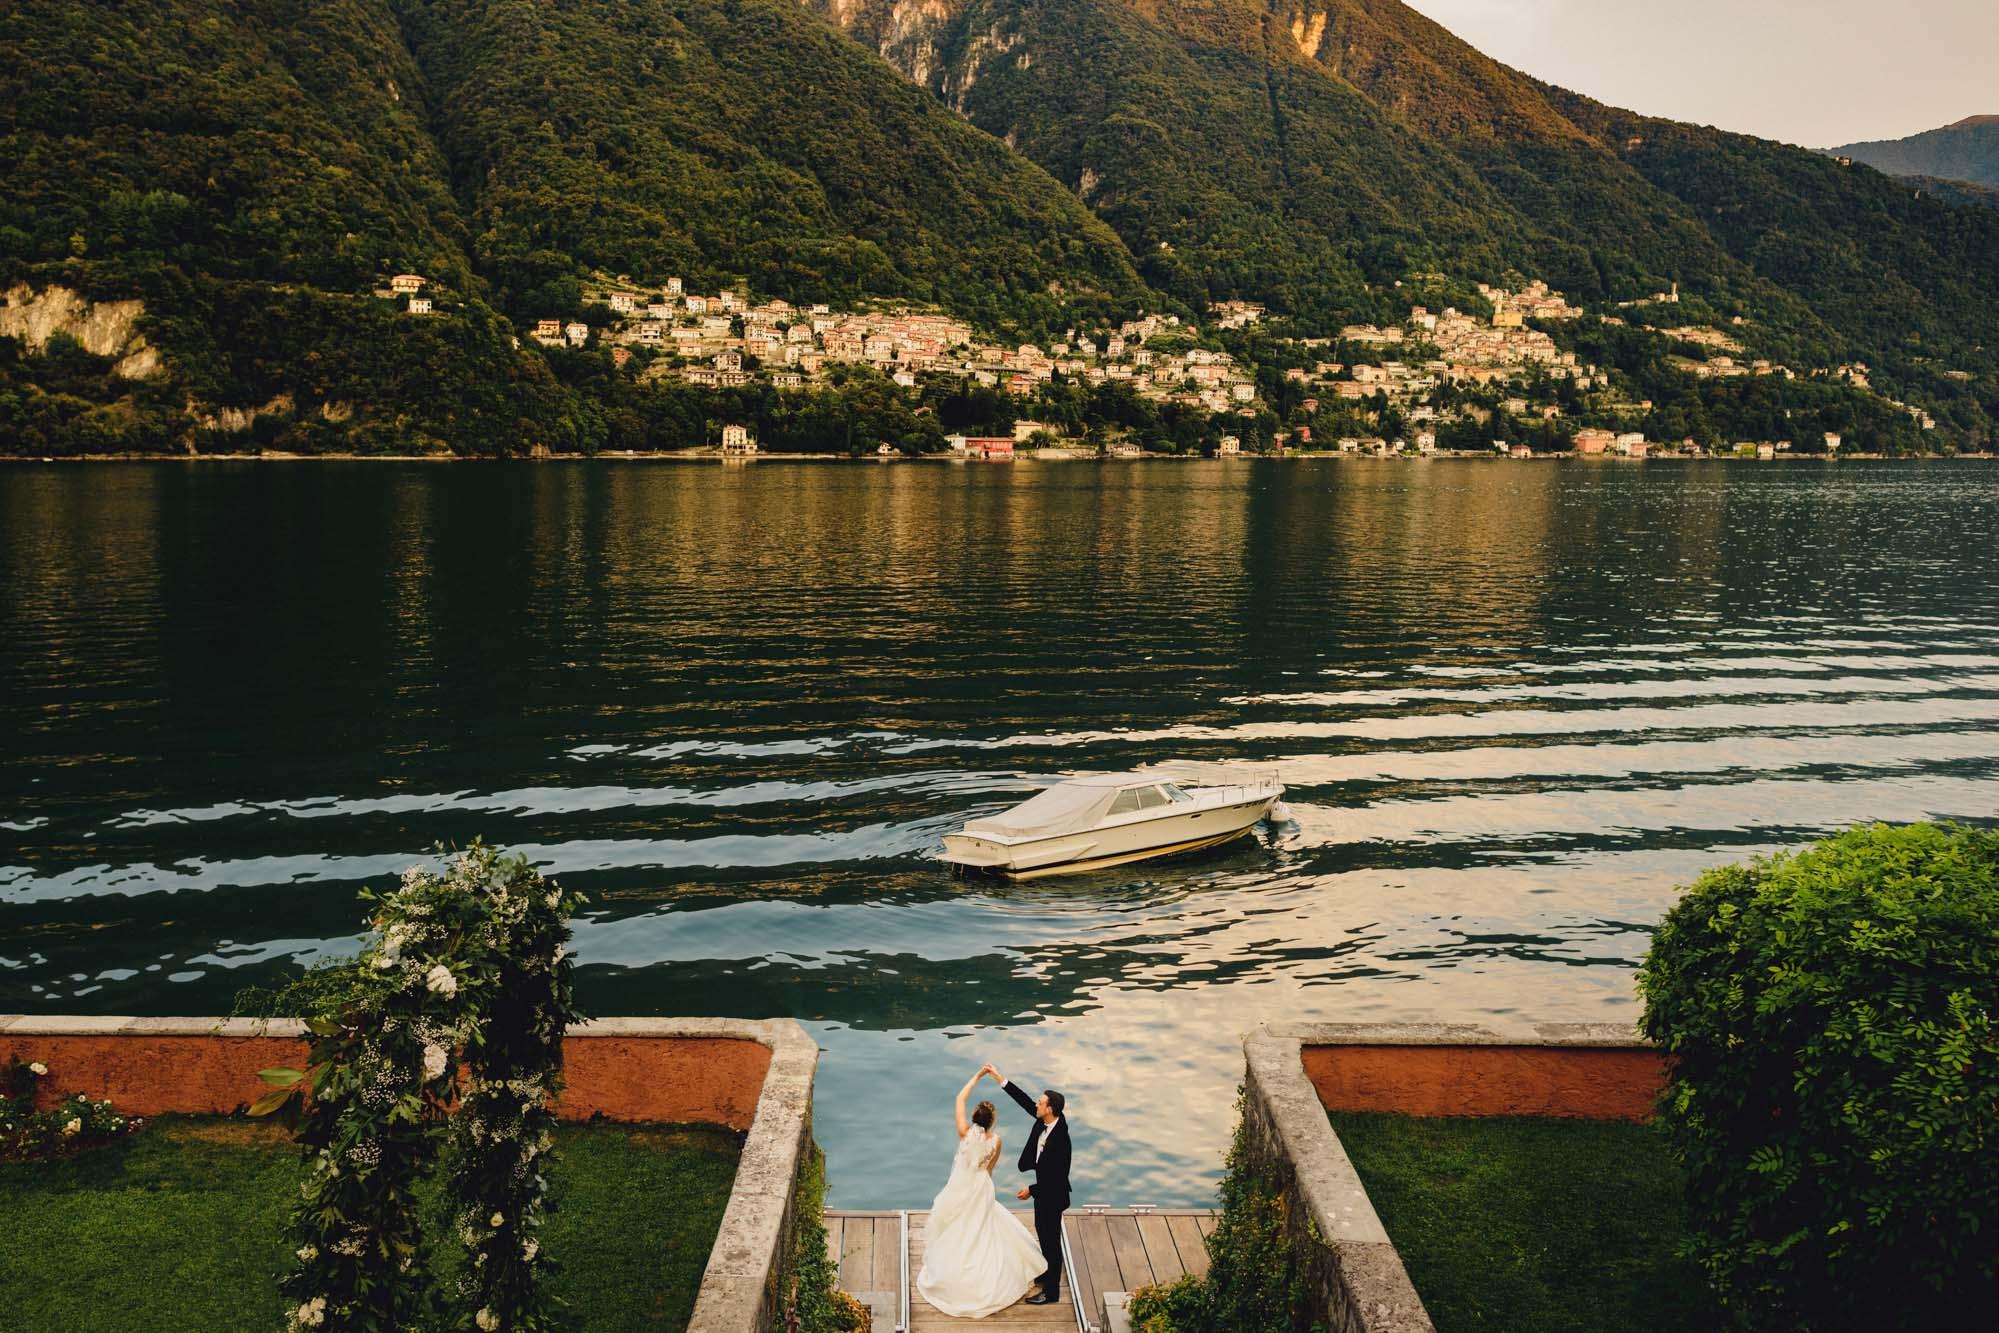 Award Winning Wedding Photographer - Best Wedding Images - This is Me - Miki Studios - Ash Davenport